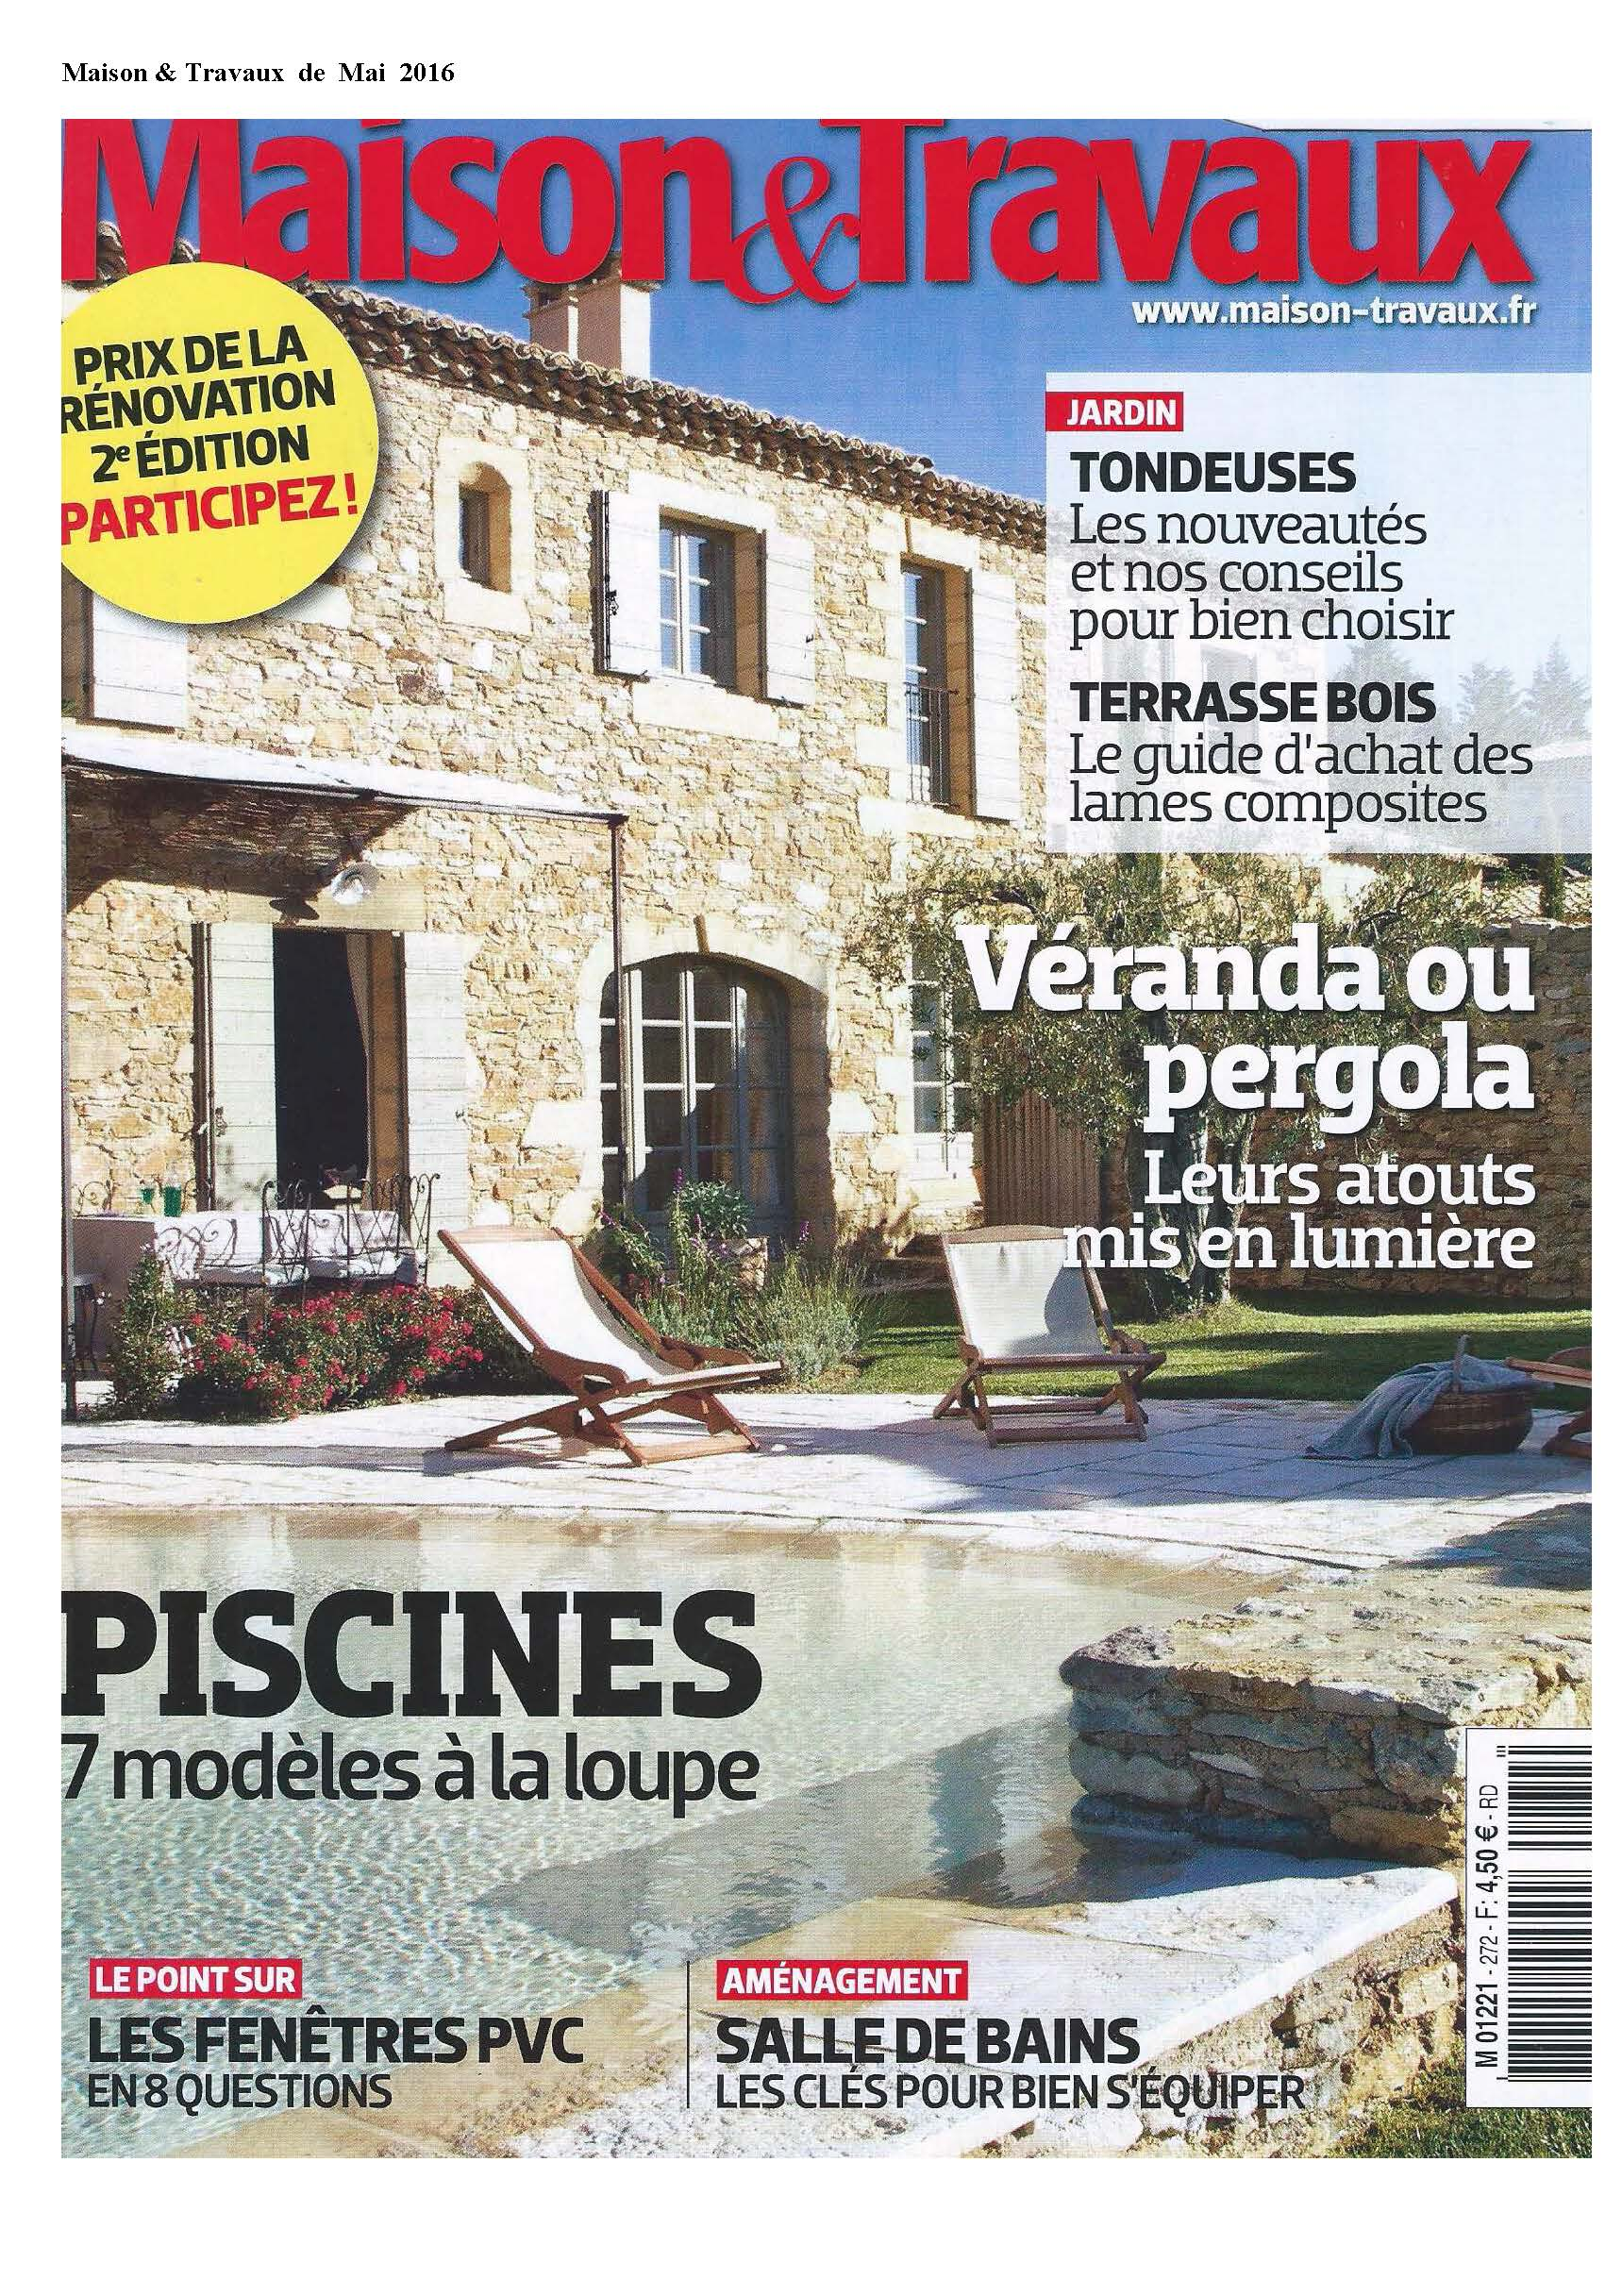 Maison & Travaux Mai 2016